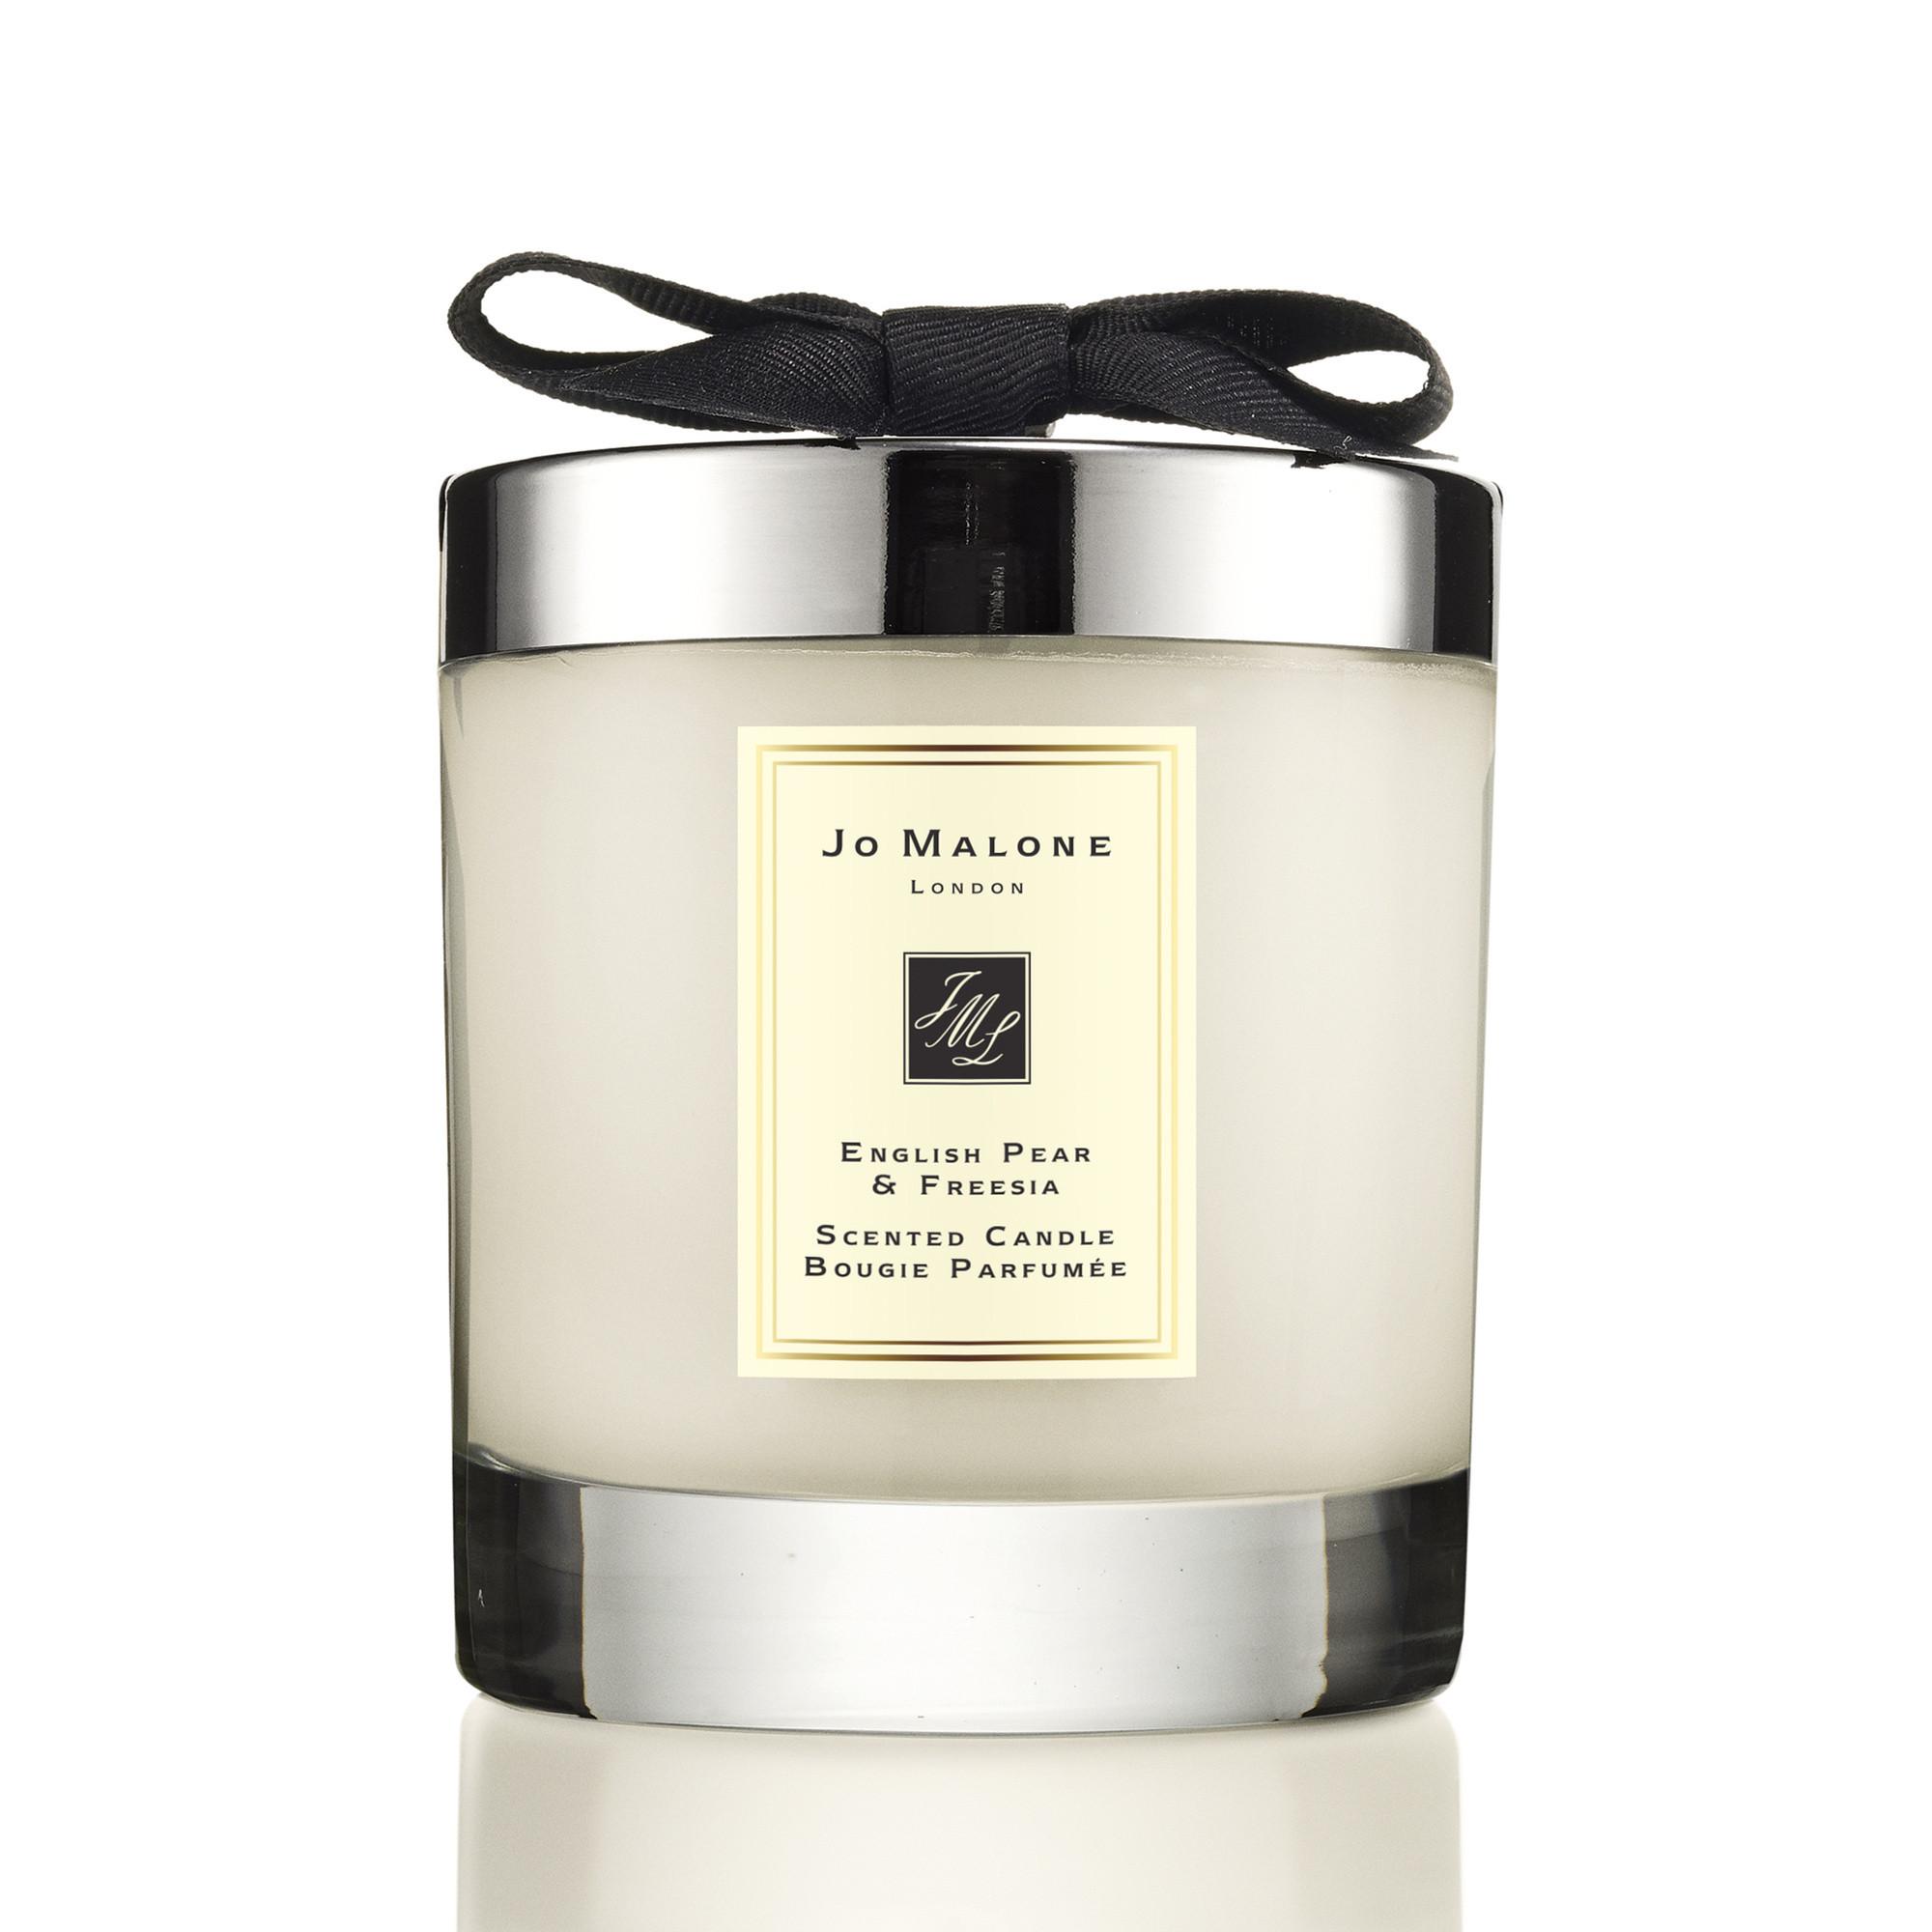 Jo Malone London english pear & freesia home candle 200 g, Nero, large image number 0